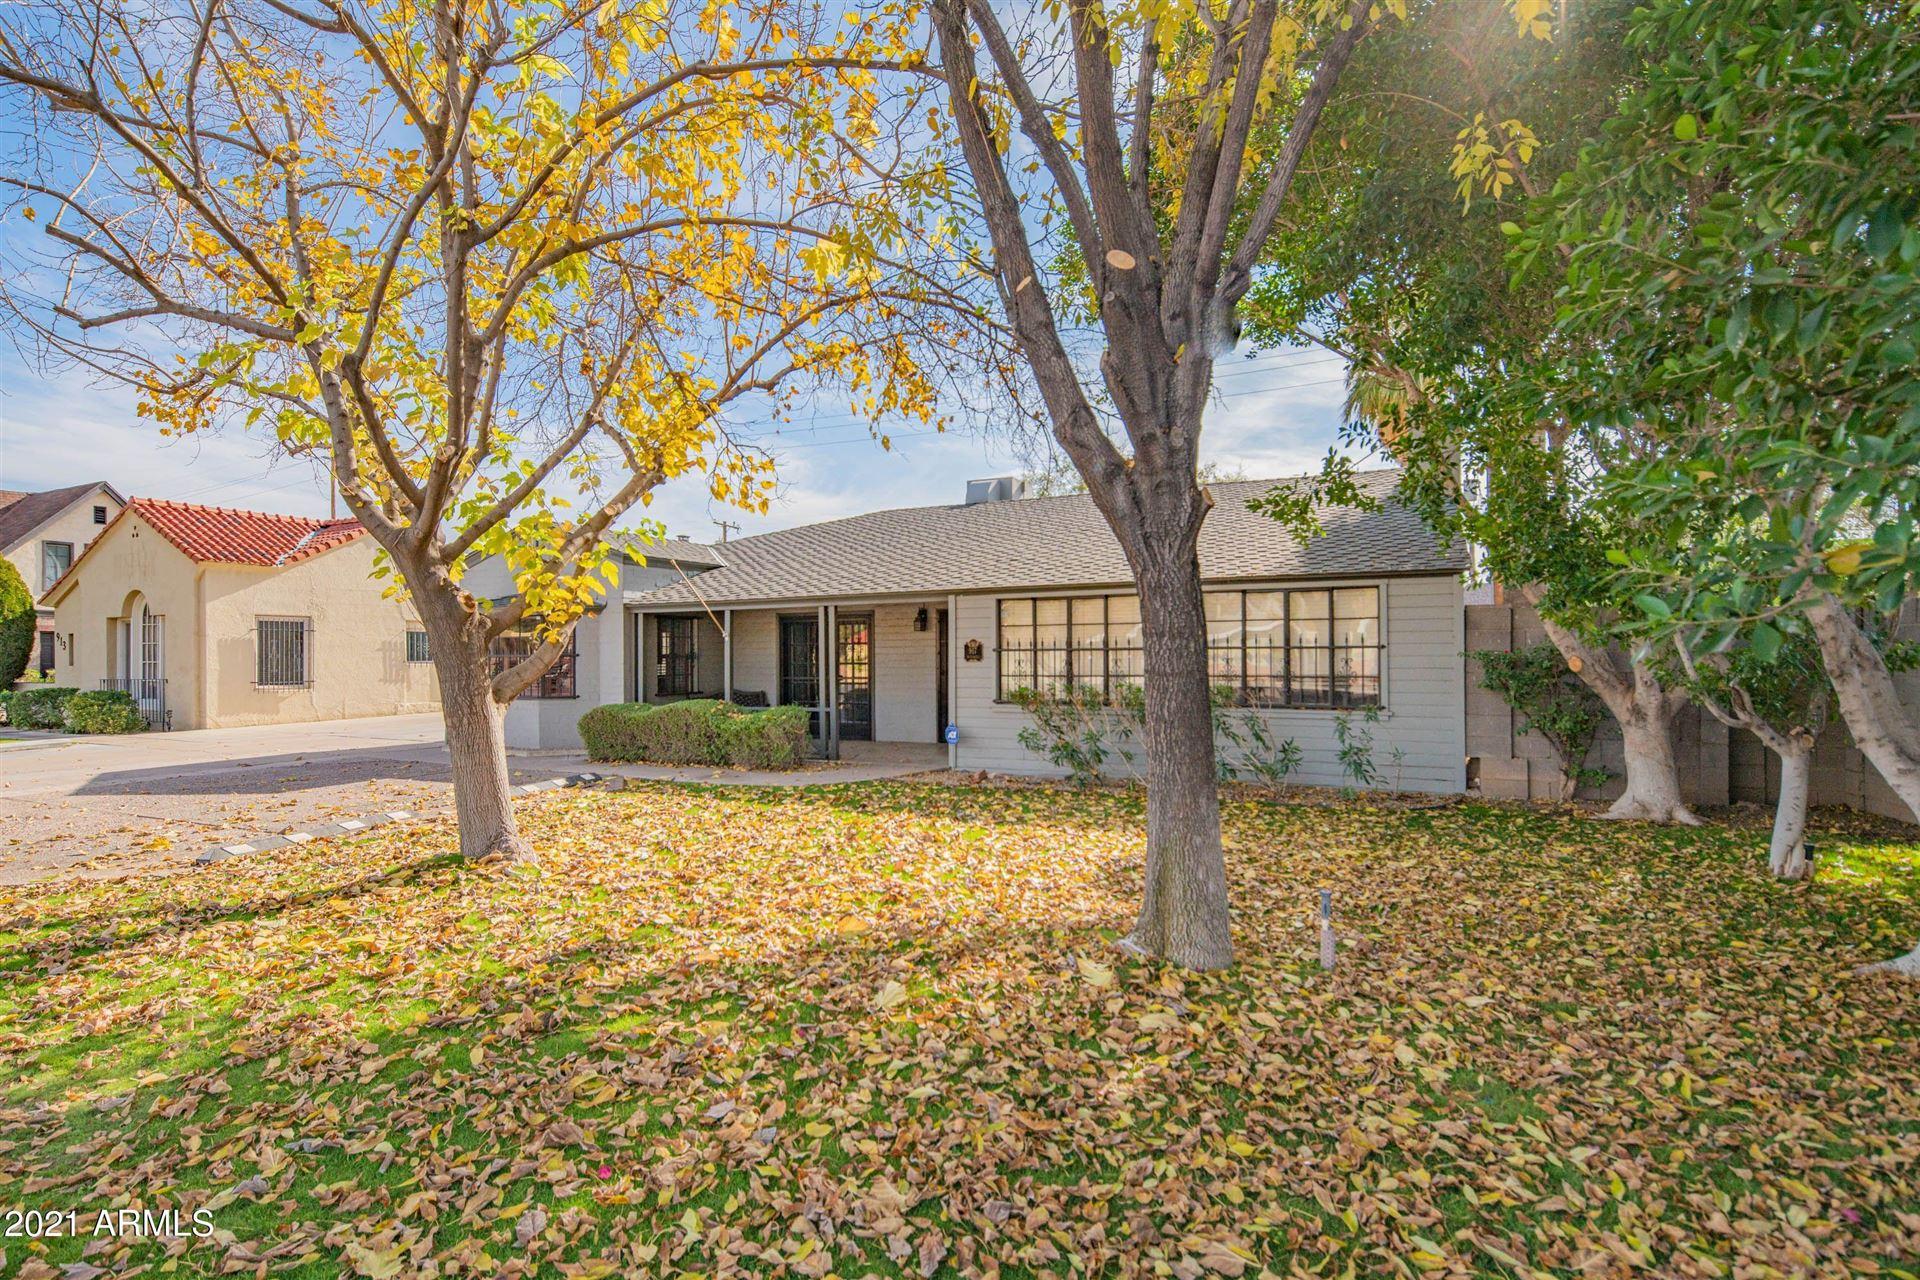 917 W MCDOWELL Road, Phoenix, AZ 85007 - #: 6180850